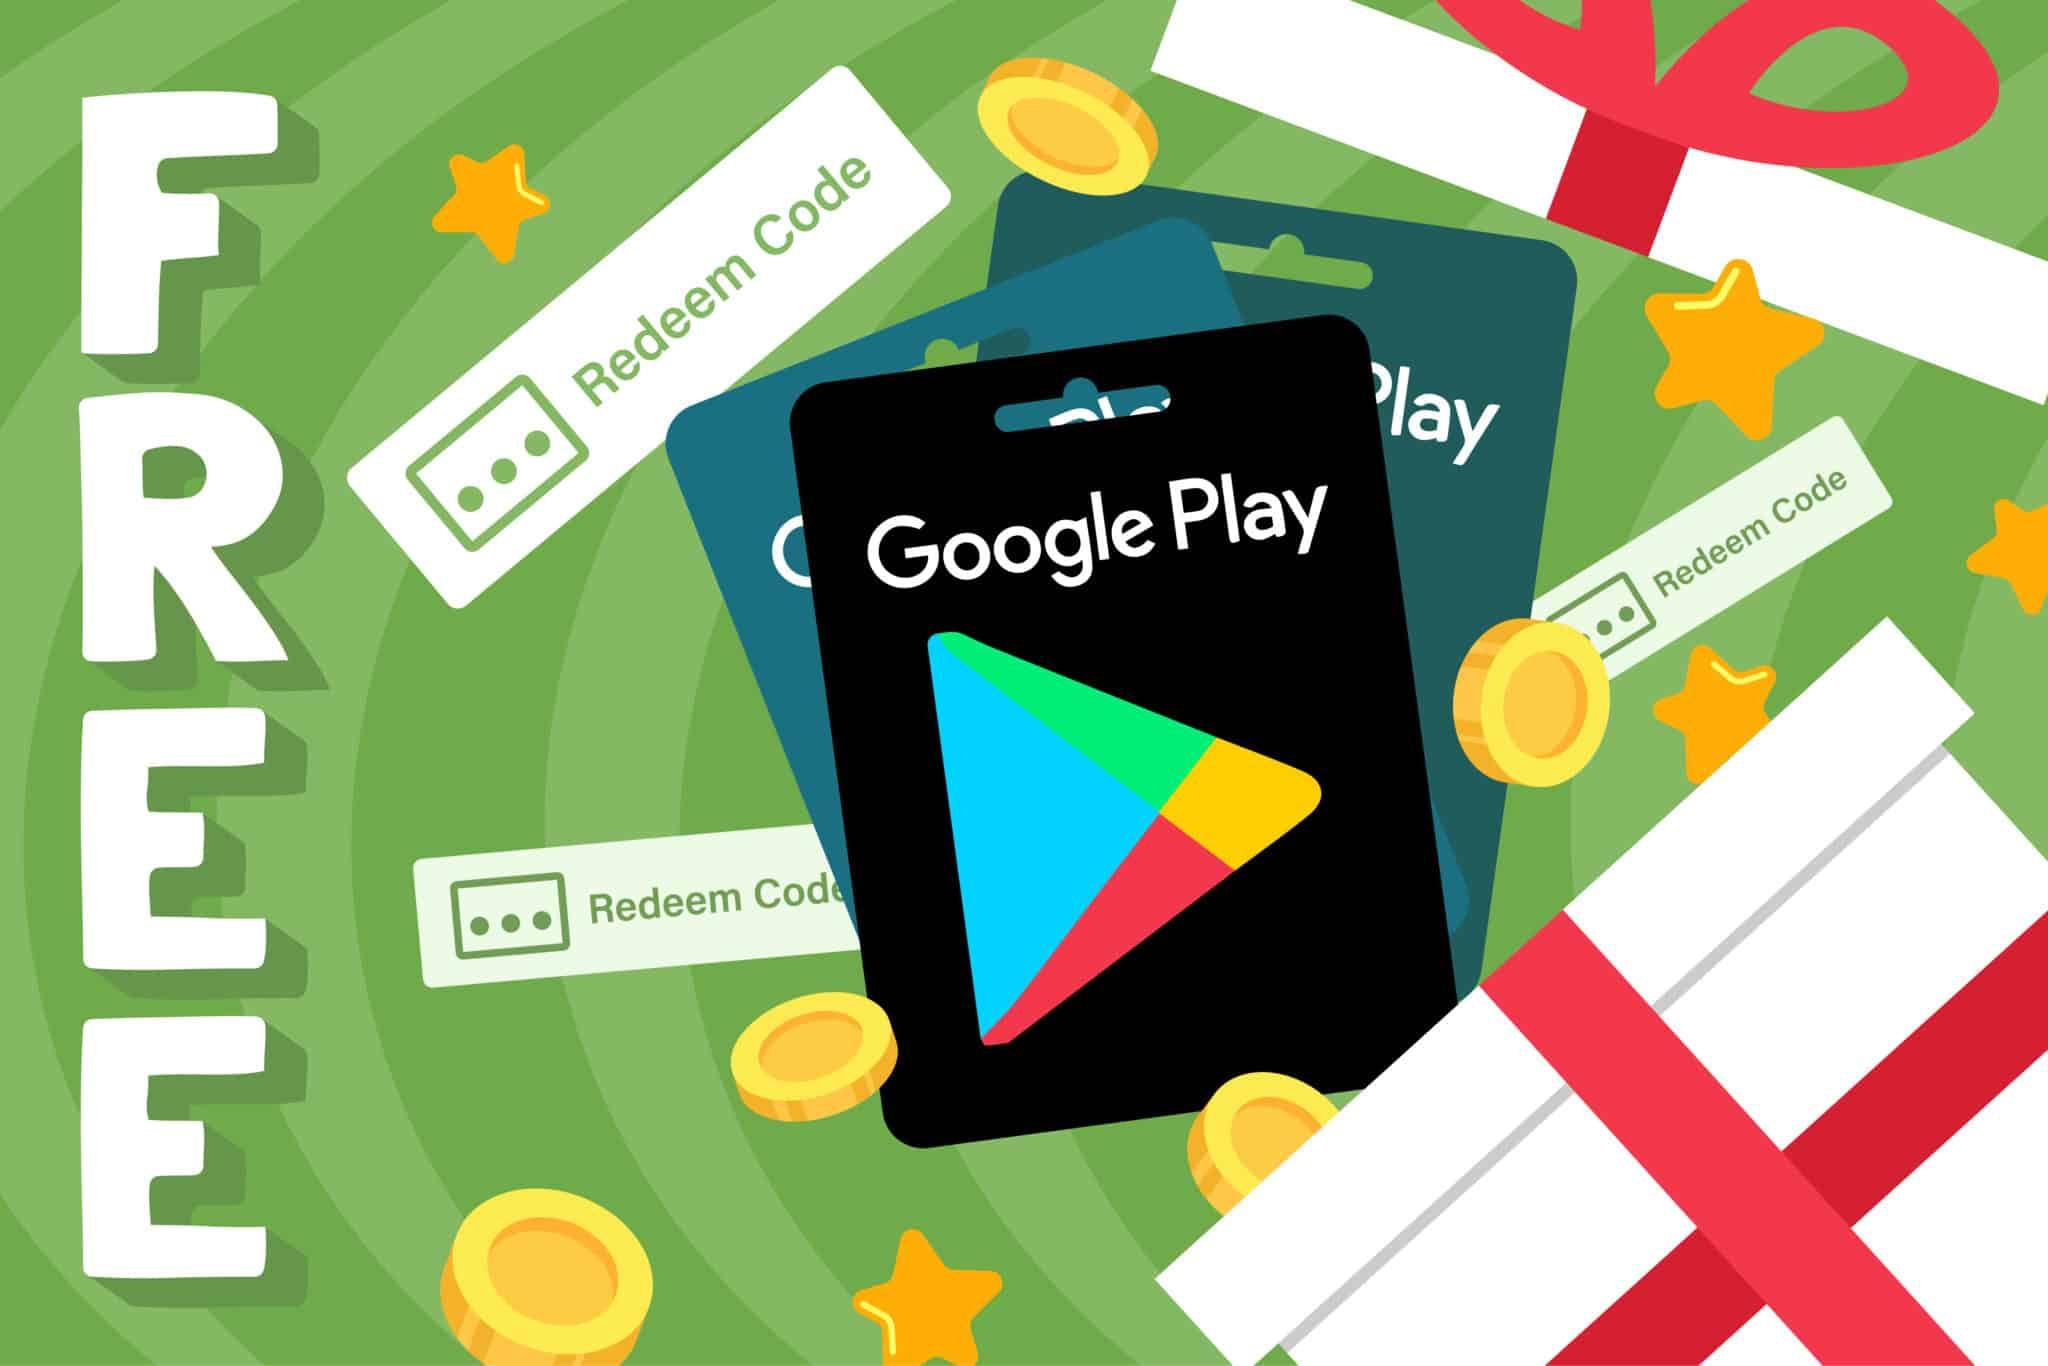 Free Google Play Credit and Codes